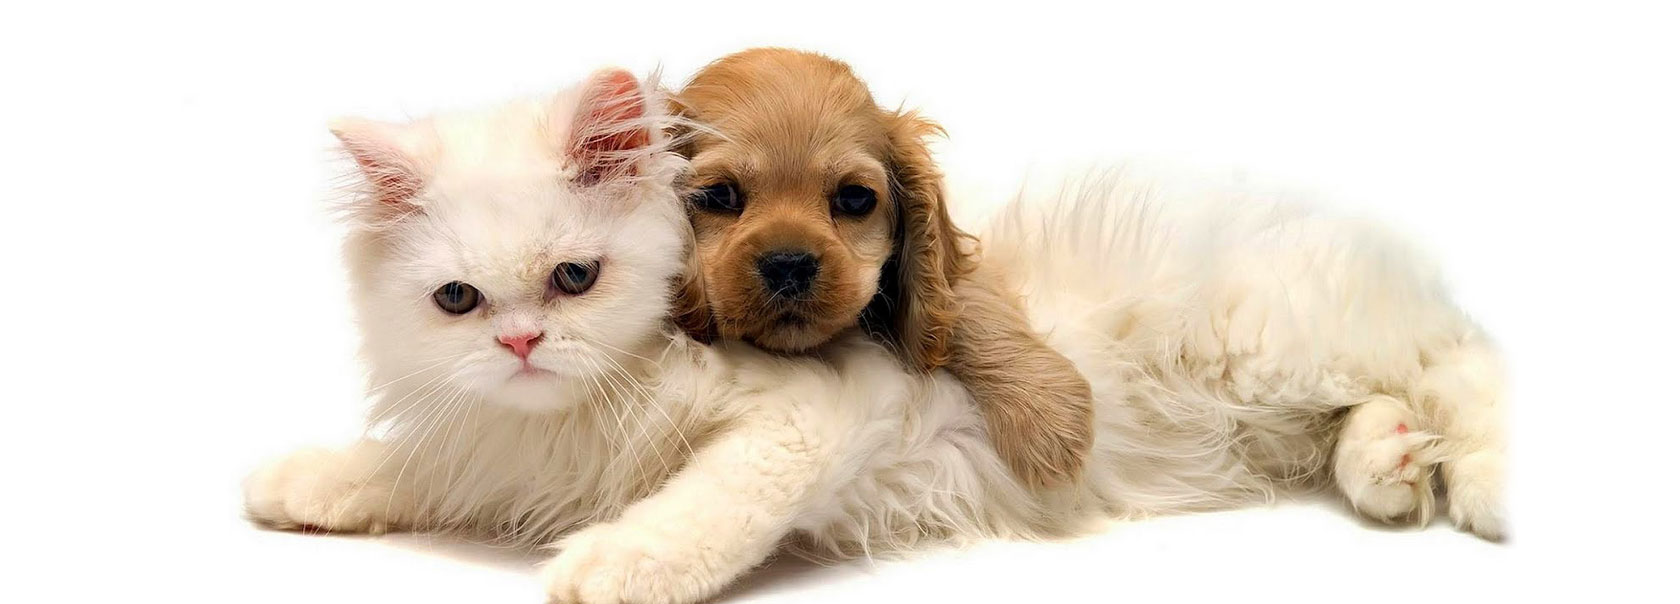 Kediden Huzur Köpekten Merhamet